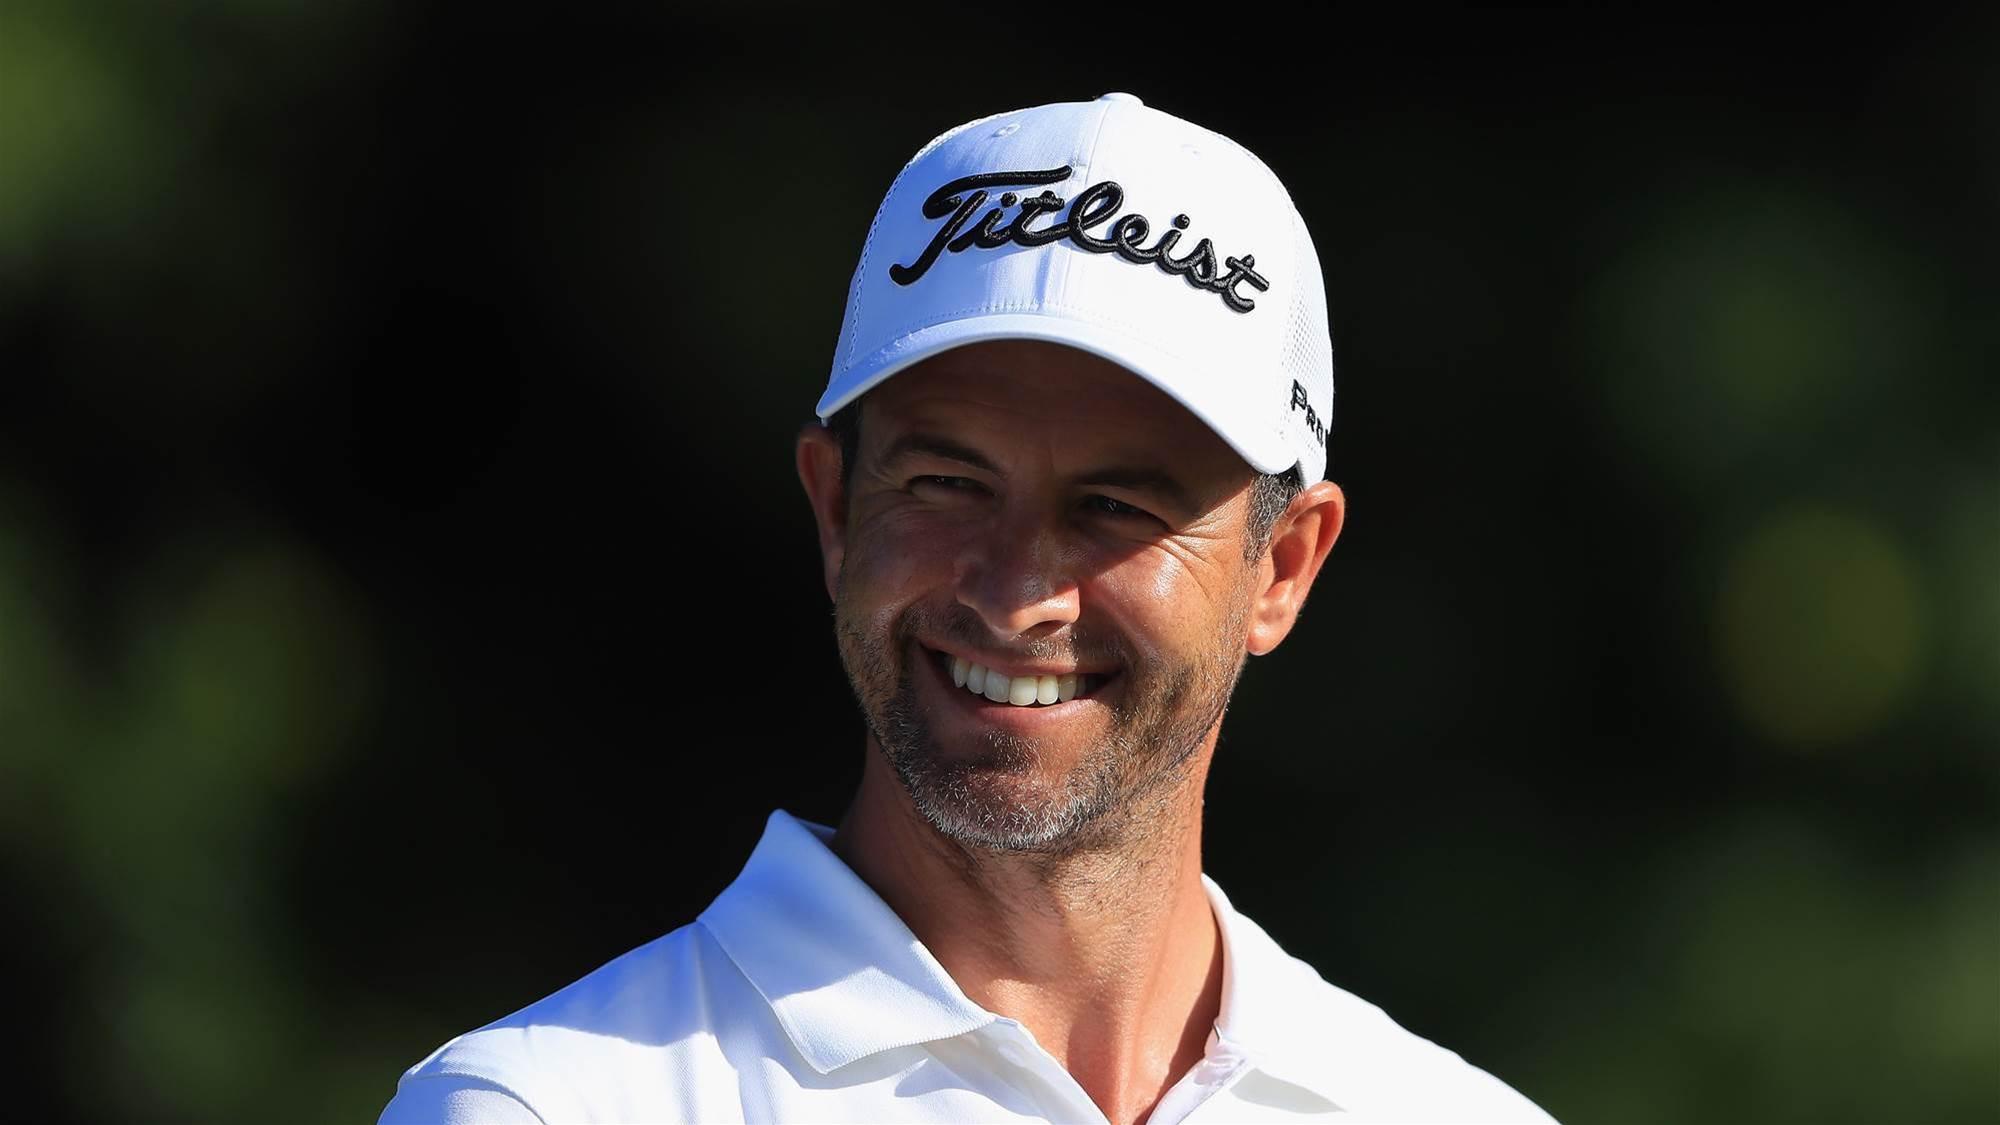 World Golf Championships not in Scott's 2019 plans